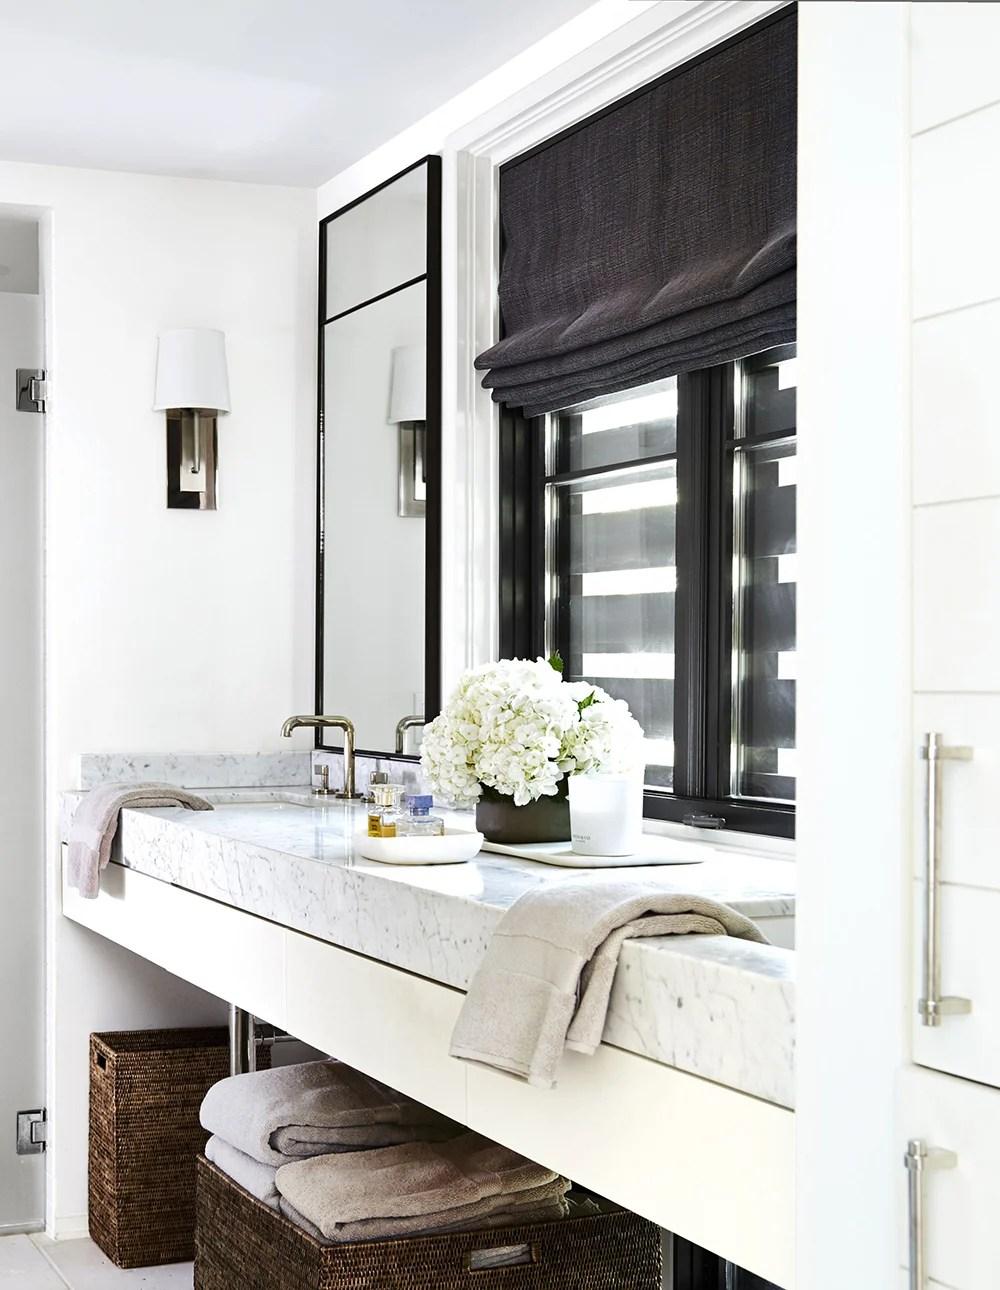 10 Pins : Bathroom Edition - roomfortuesday.com